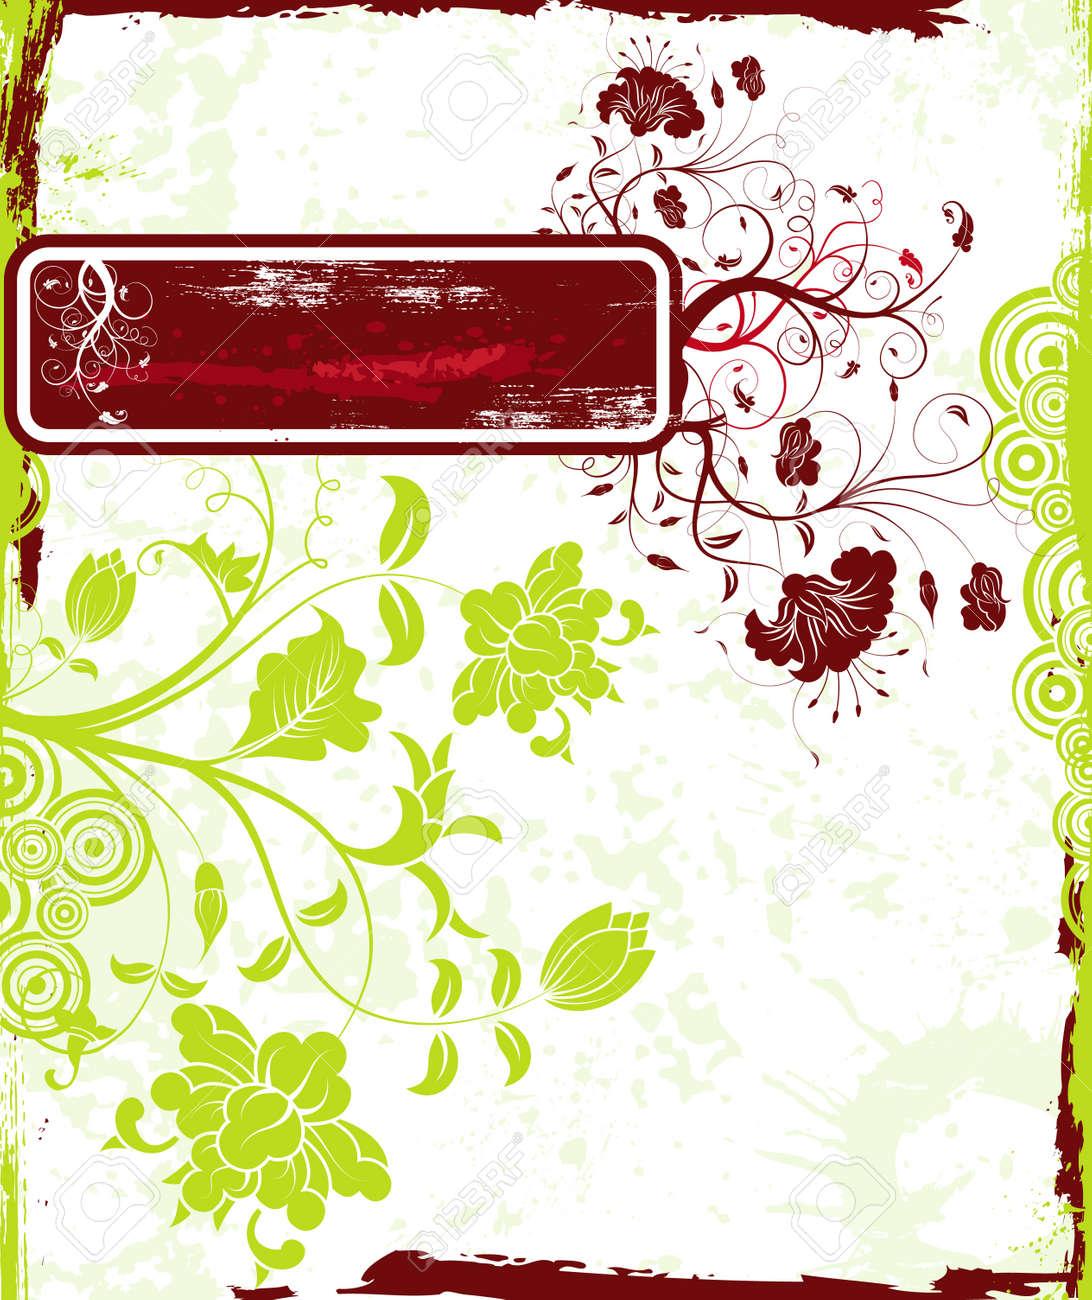 Abstract grunge floral frame, element for design, vector illustration Stock Photo - 873533